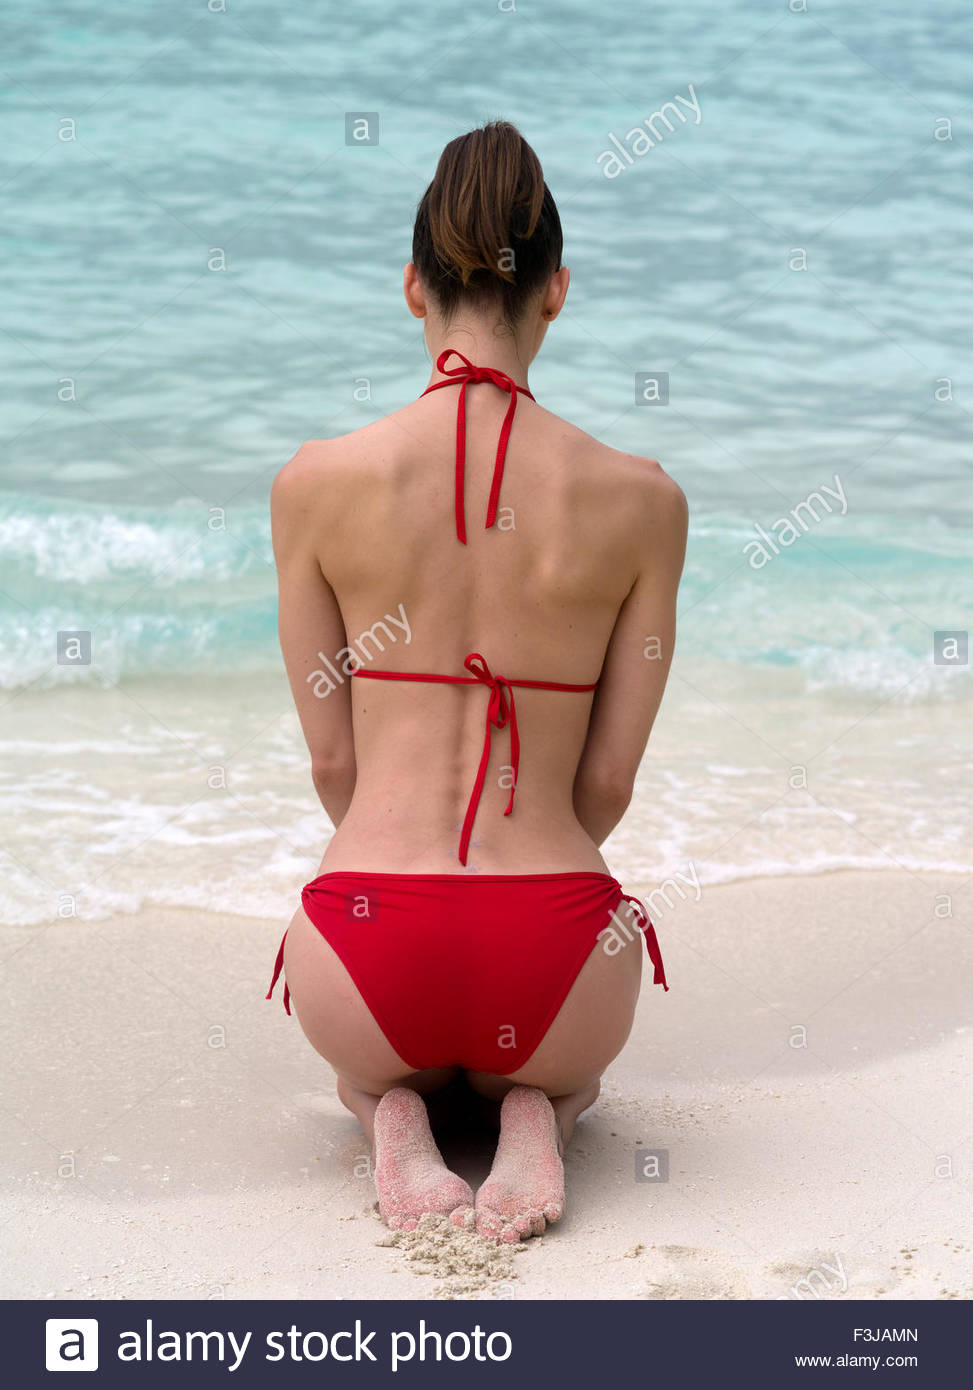 girl bikini rearview images - usseek.com